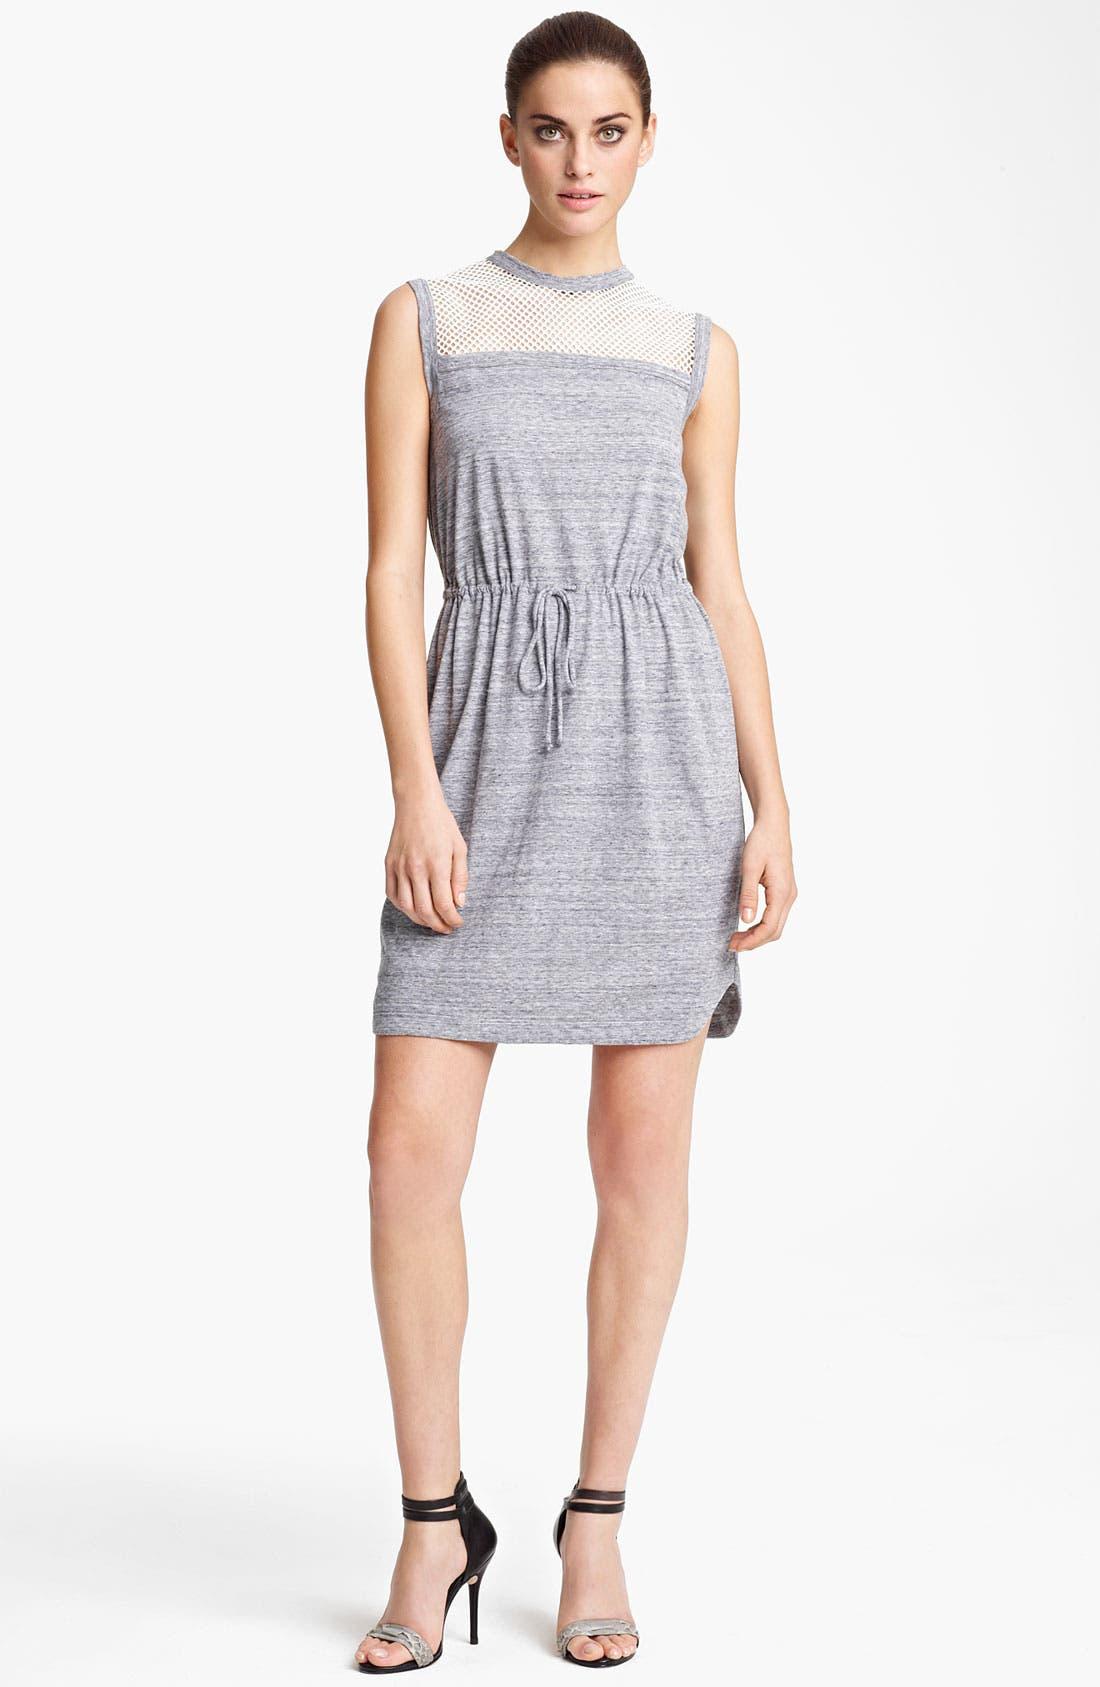 Alternate Image 1 Selected - Yigal Azrouël Sleeveless Jersey Dress